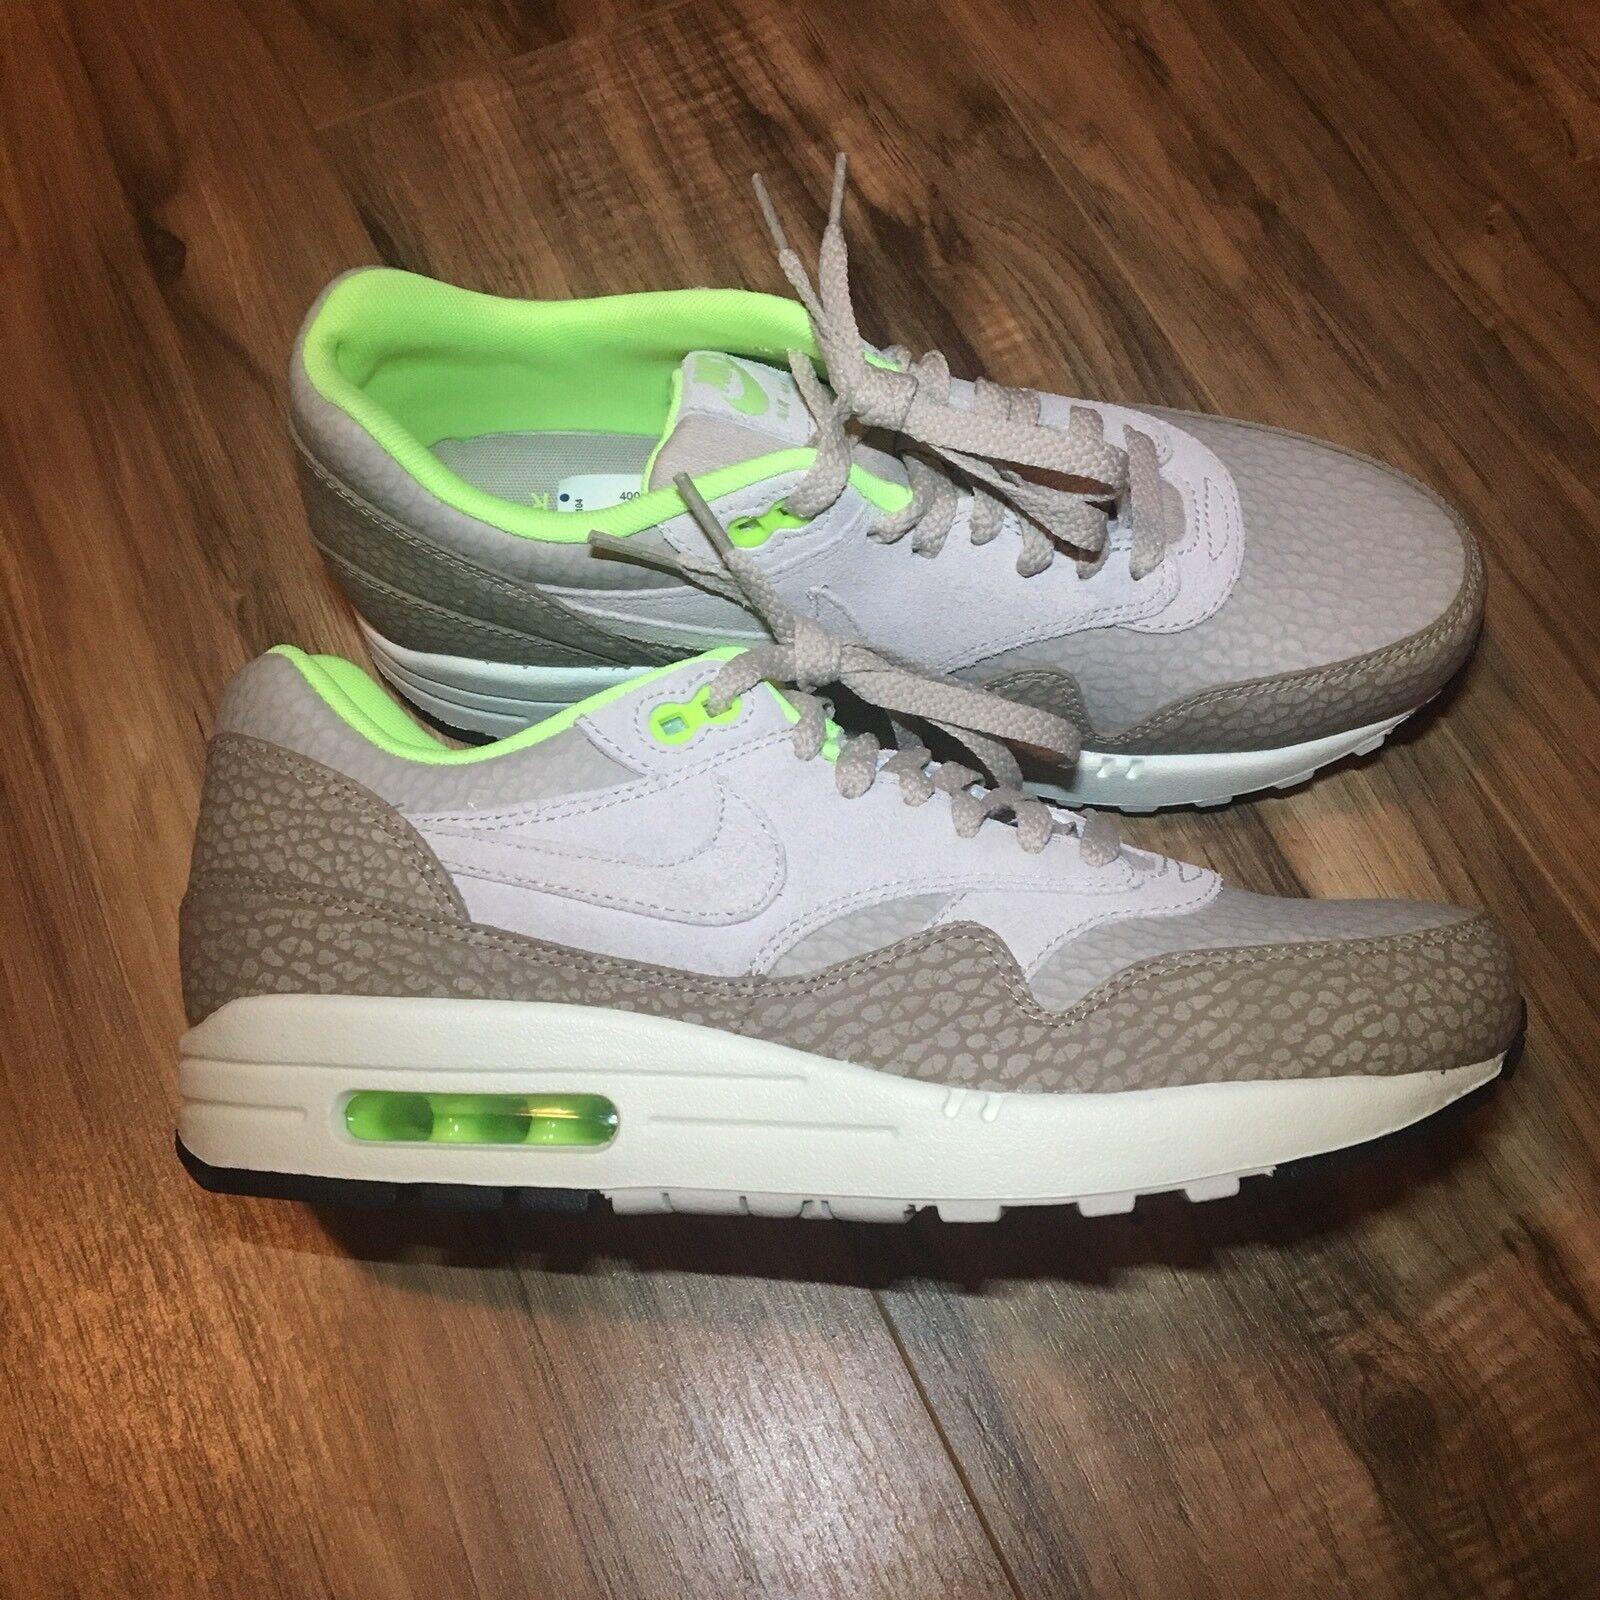 Nike Air Max 1 Premium Sneaker TAN BEIGE DESERT CAMO GREEN 512033-203 Men's Sz 8